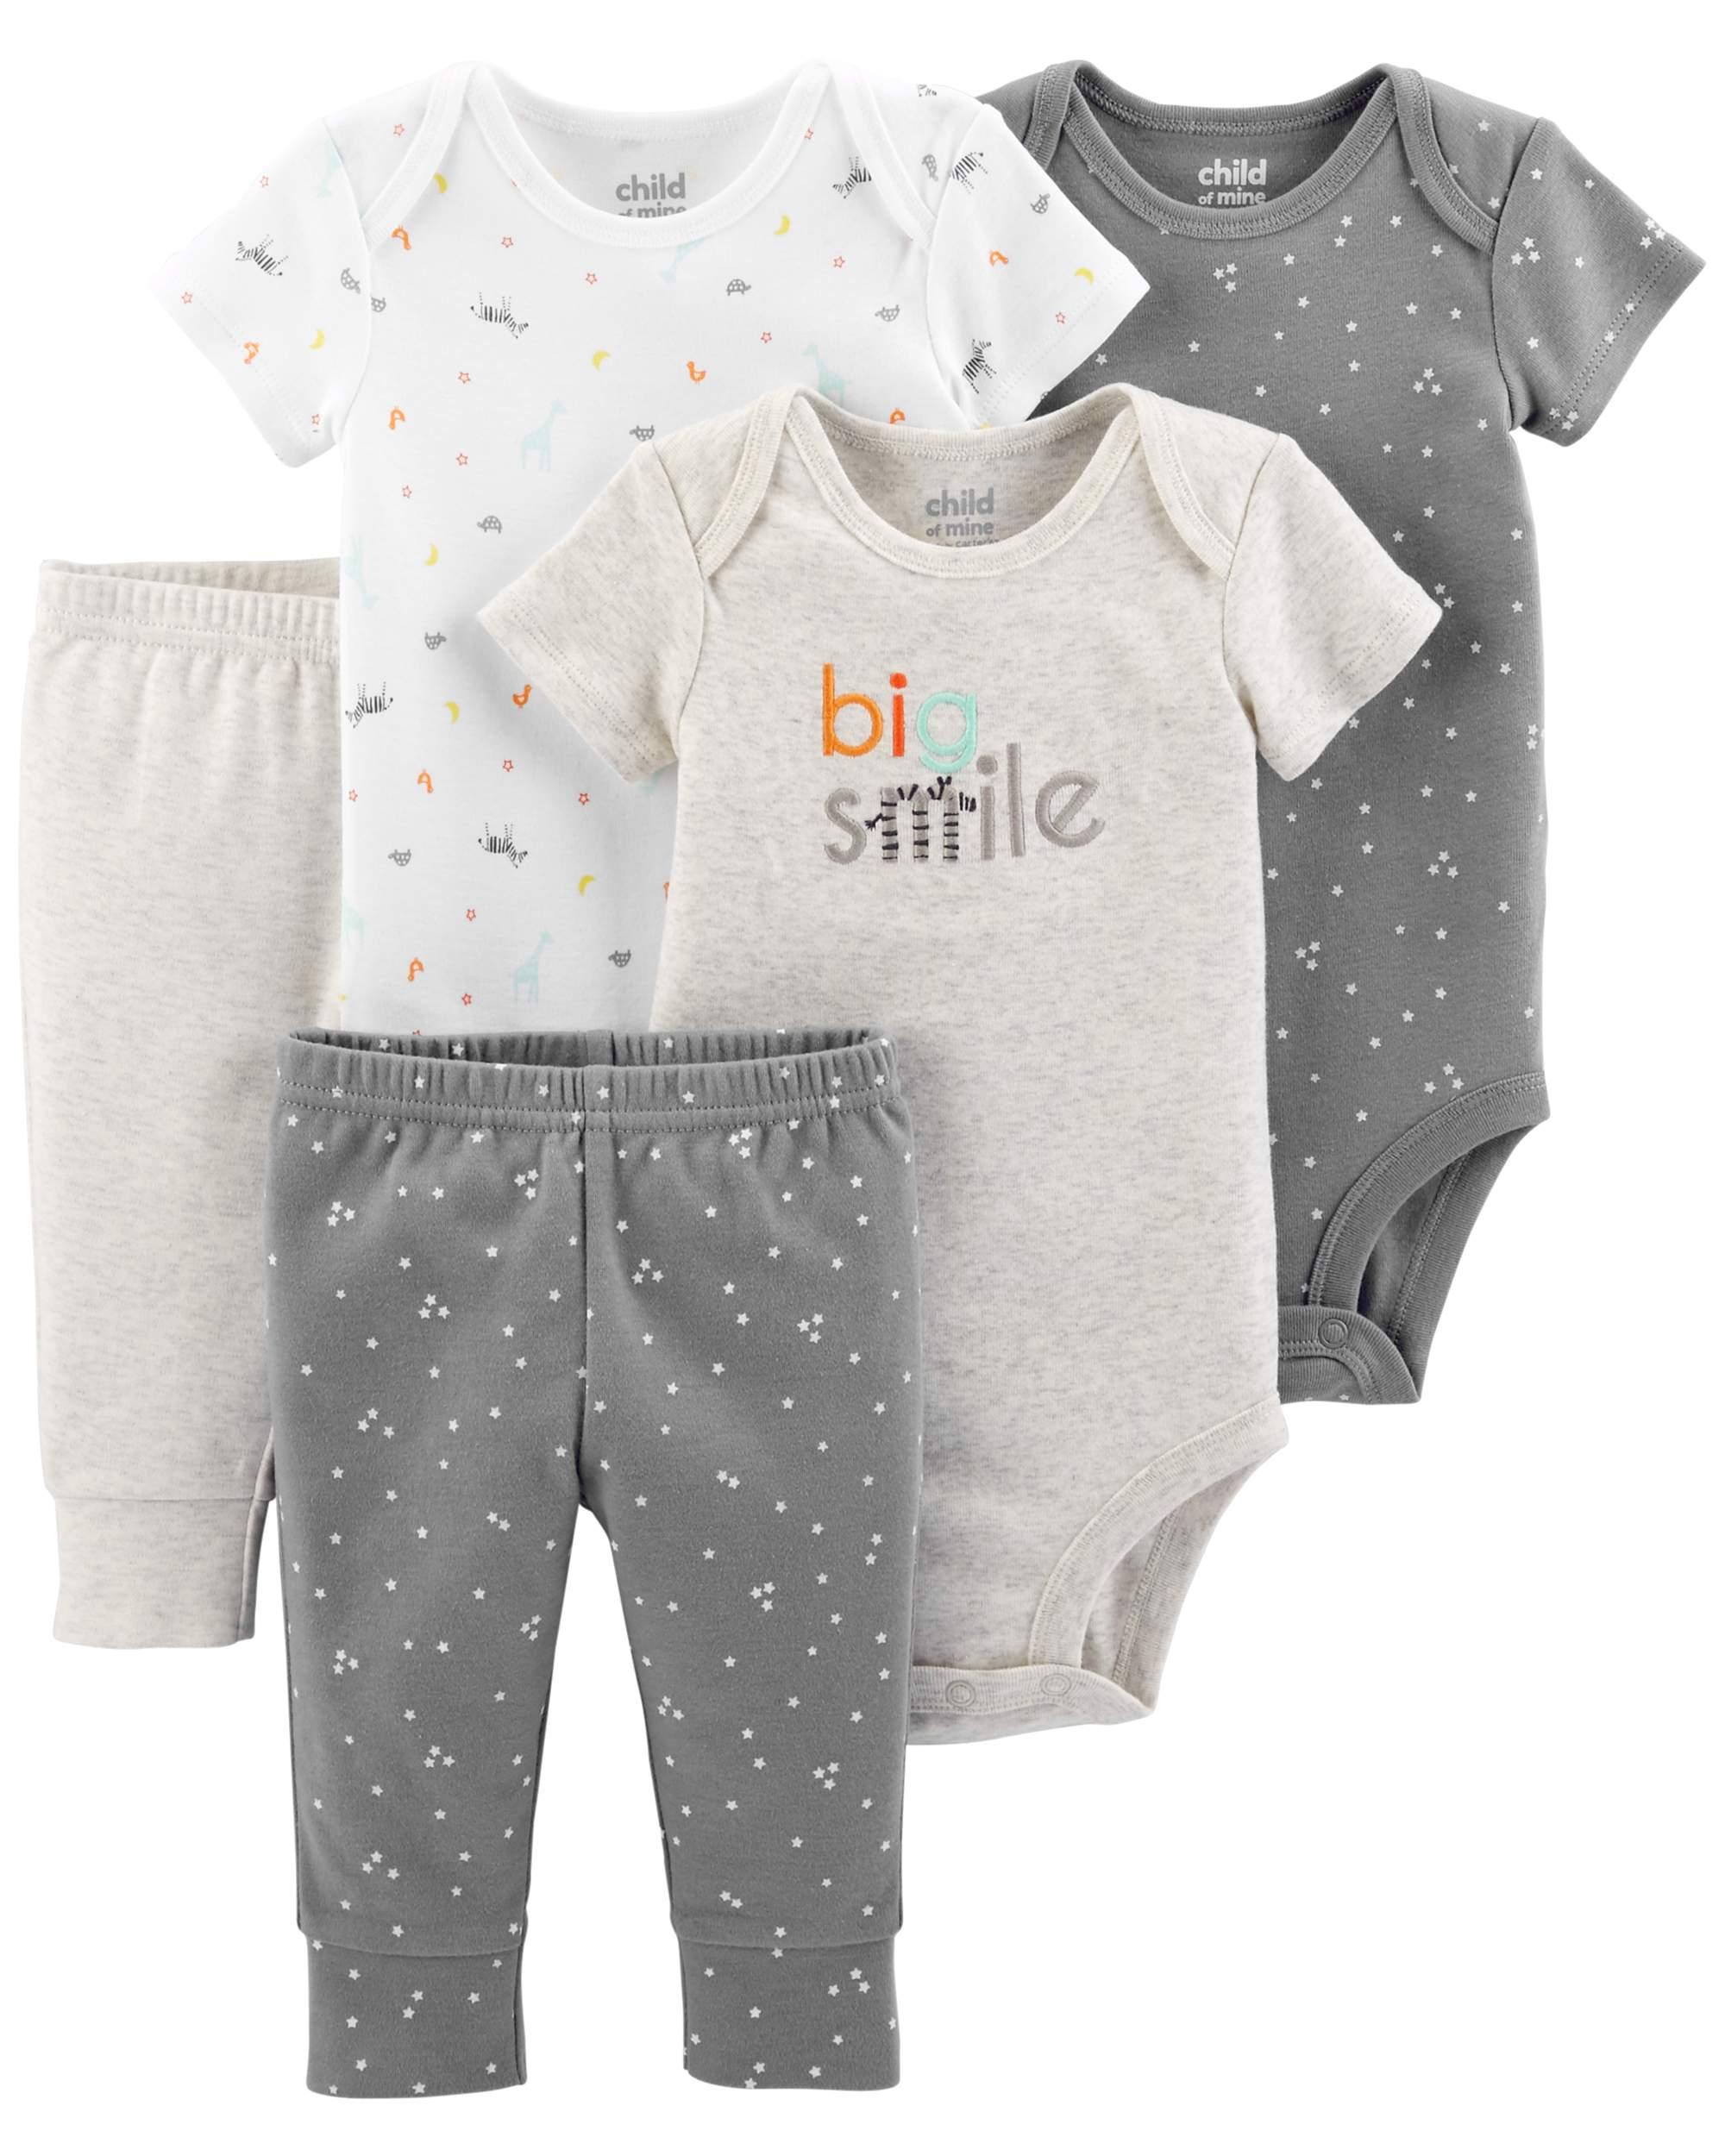 9ba94f689 Baby's Fashion (0-2years Short Sleeve Bodysuits & Pants, 5pc Set (Baby Boys  or Baby Girls Unisex)